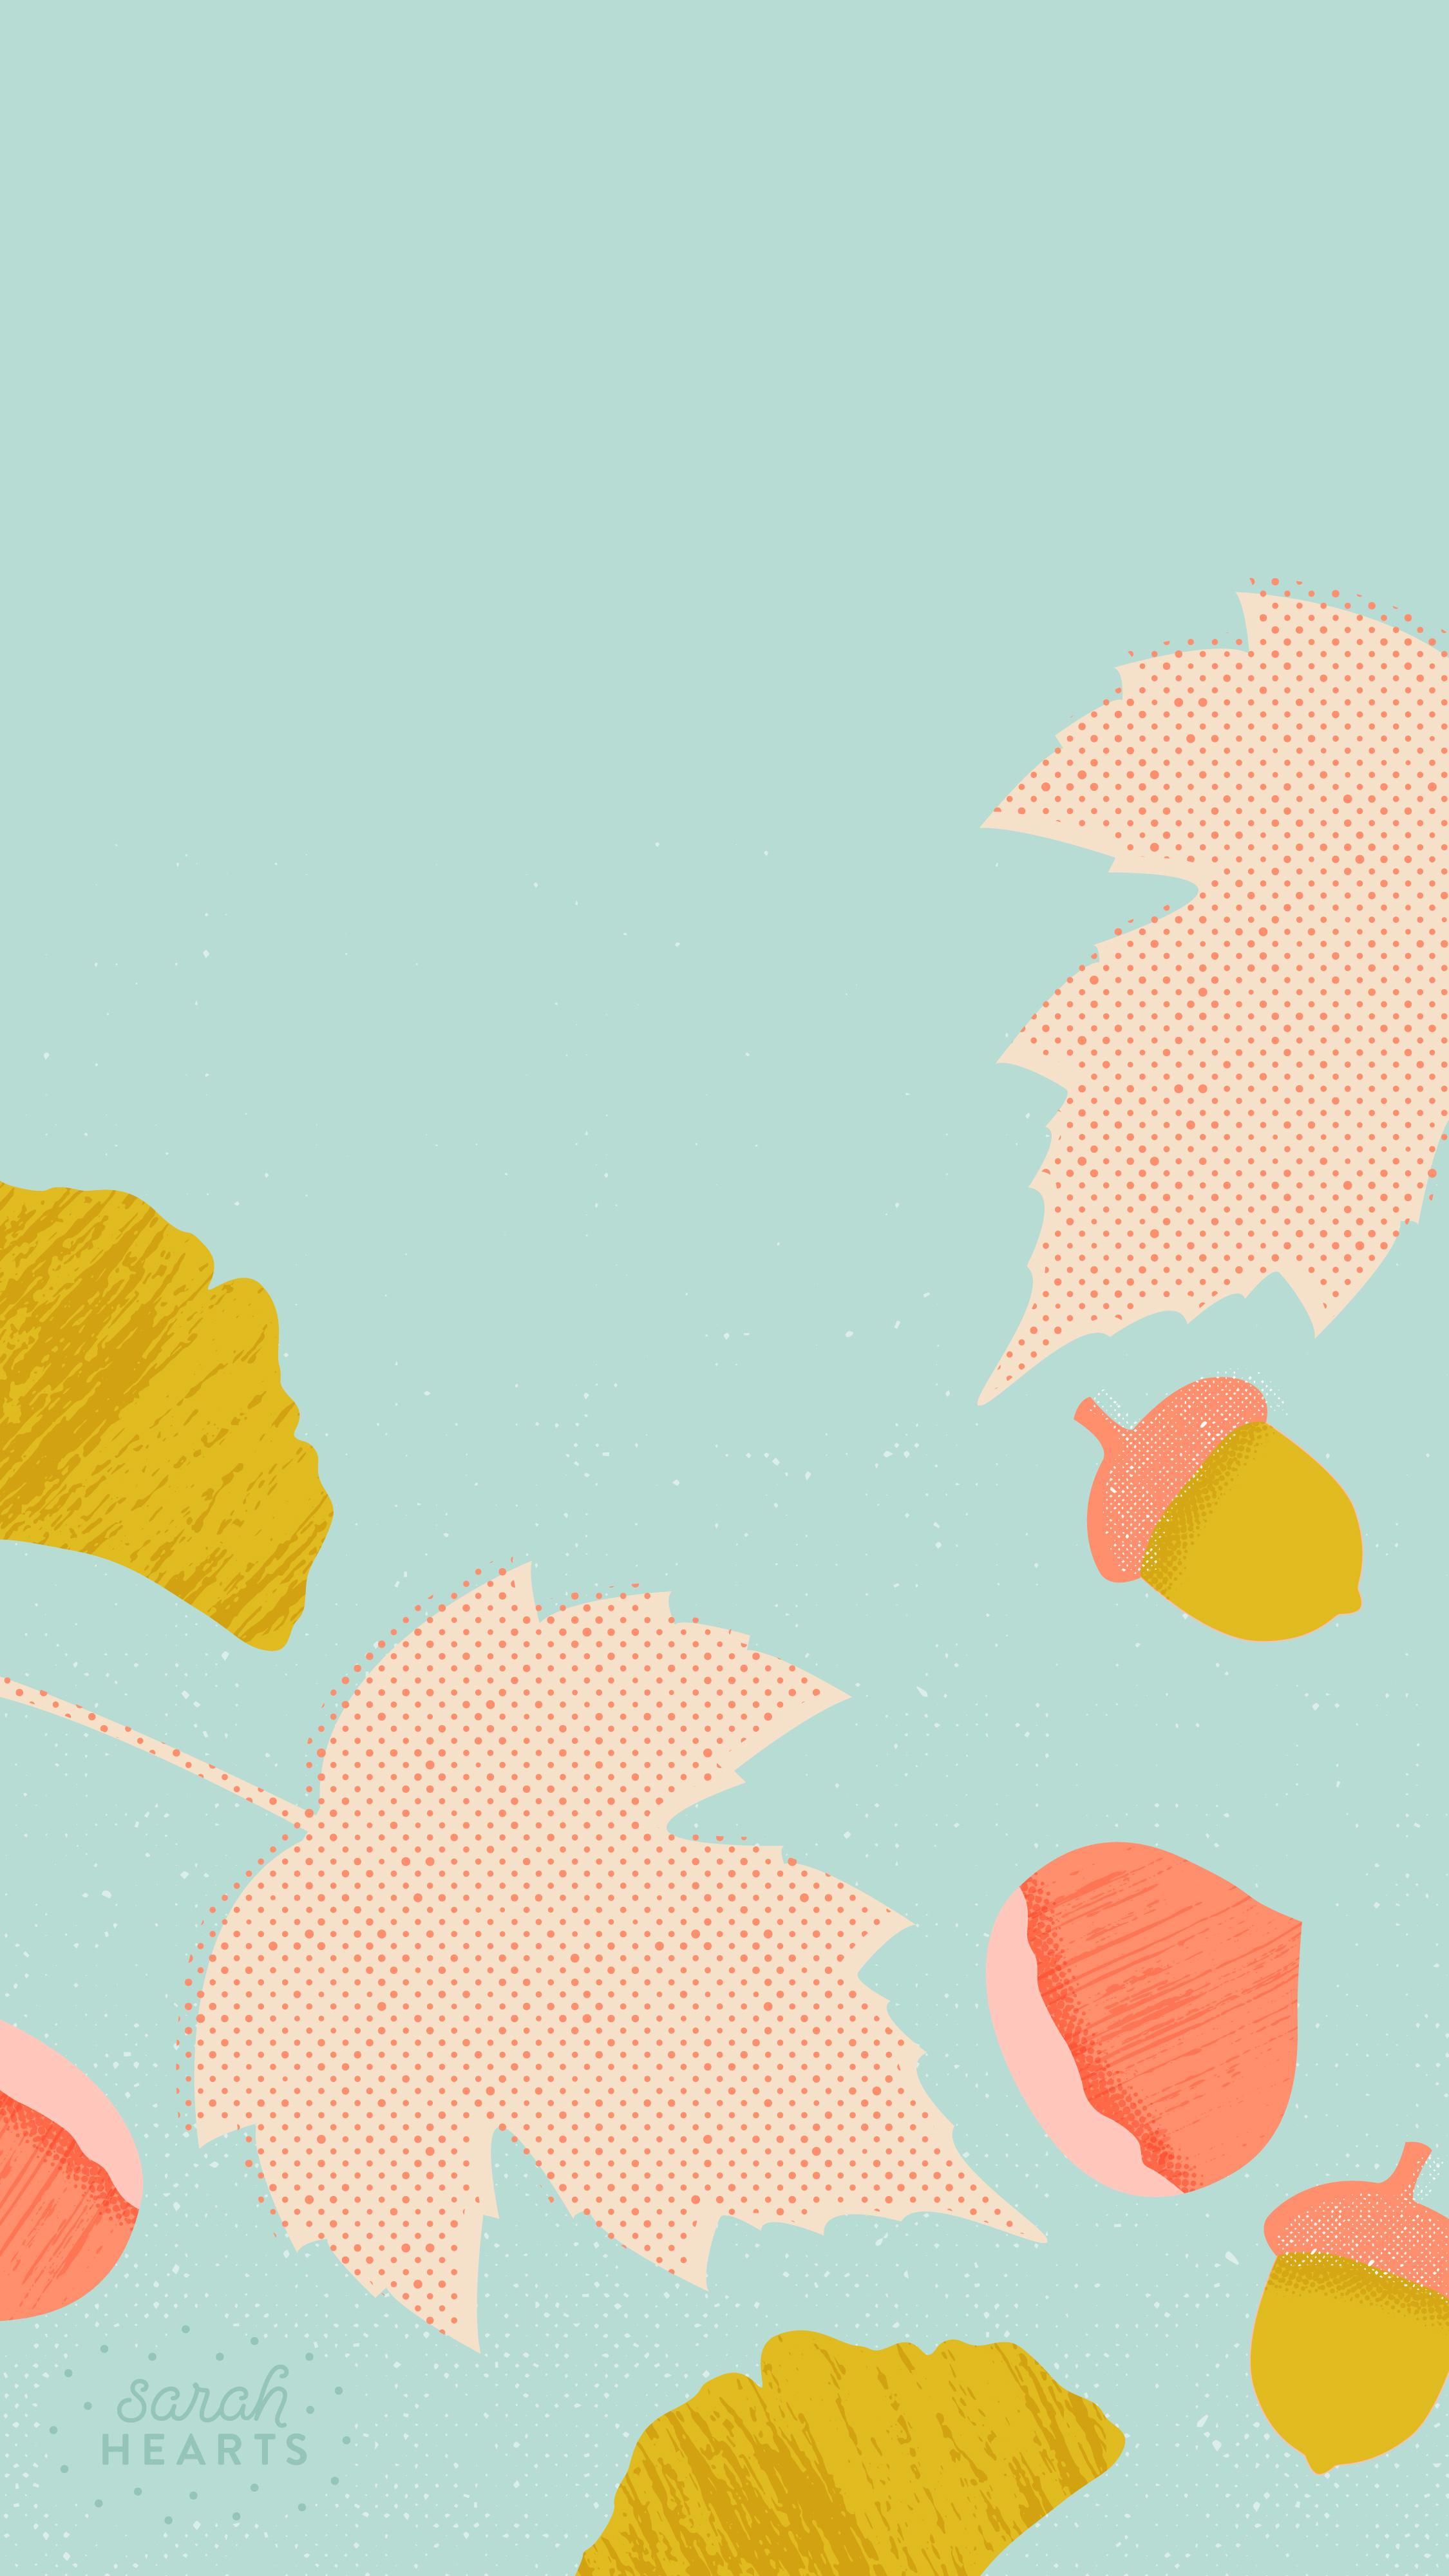 October Calendar Wallpaper Iphone : October calendar wallpaper sarah hearts